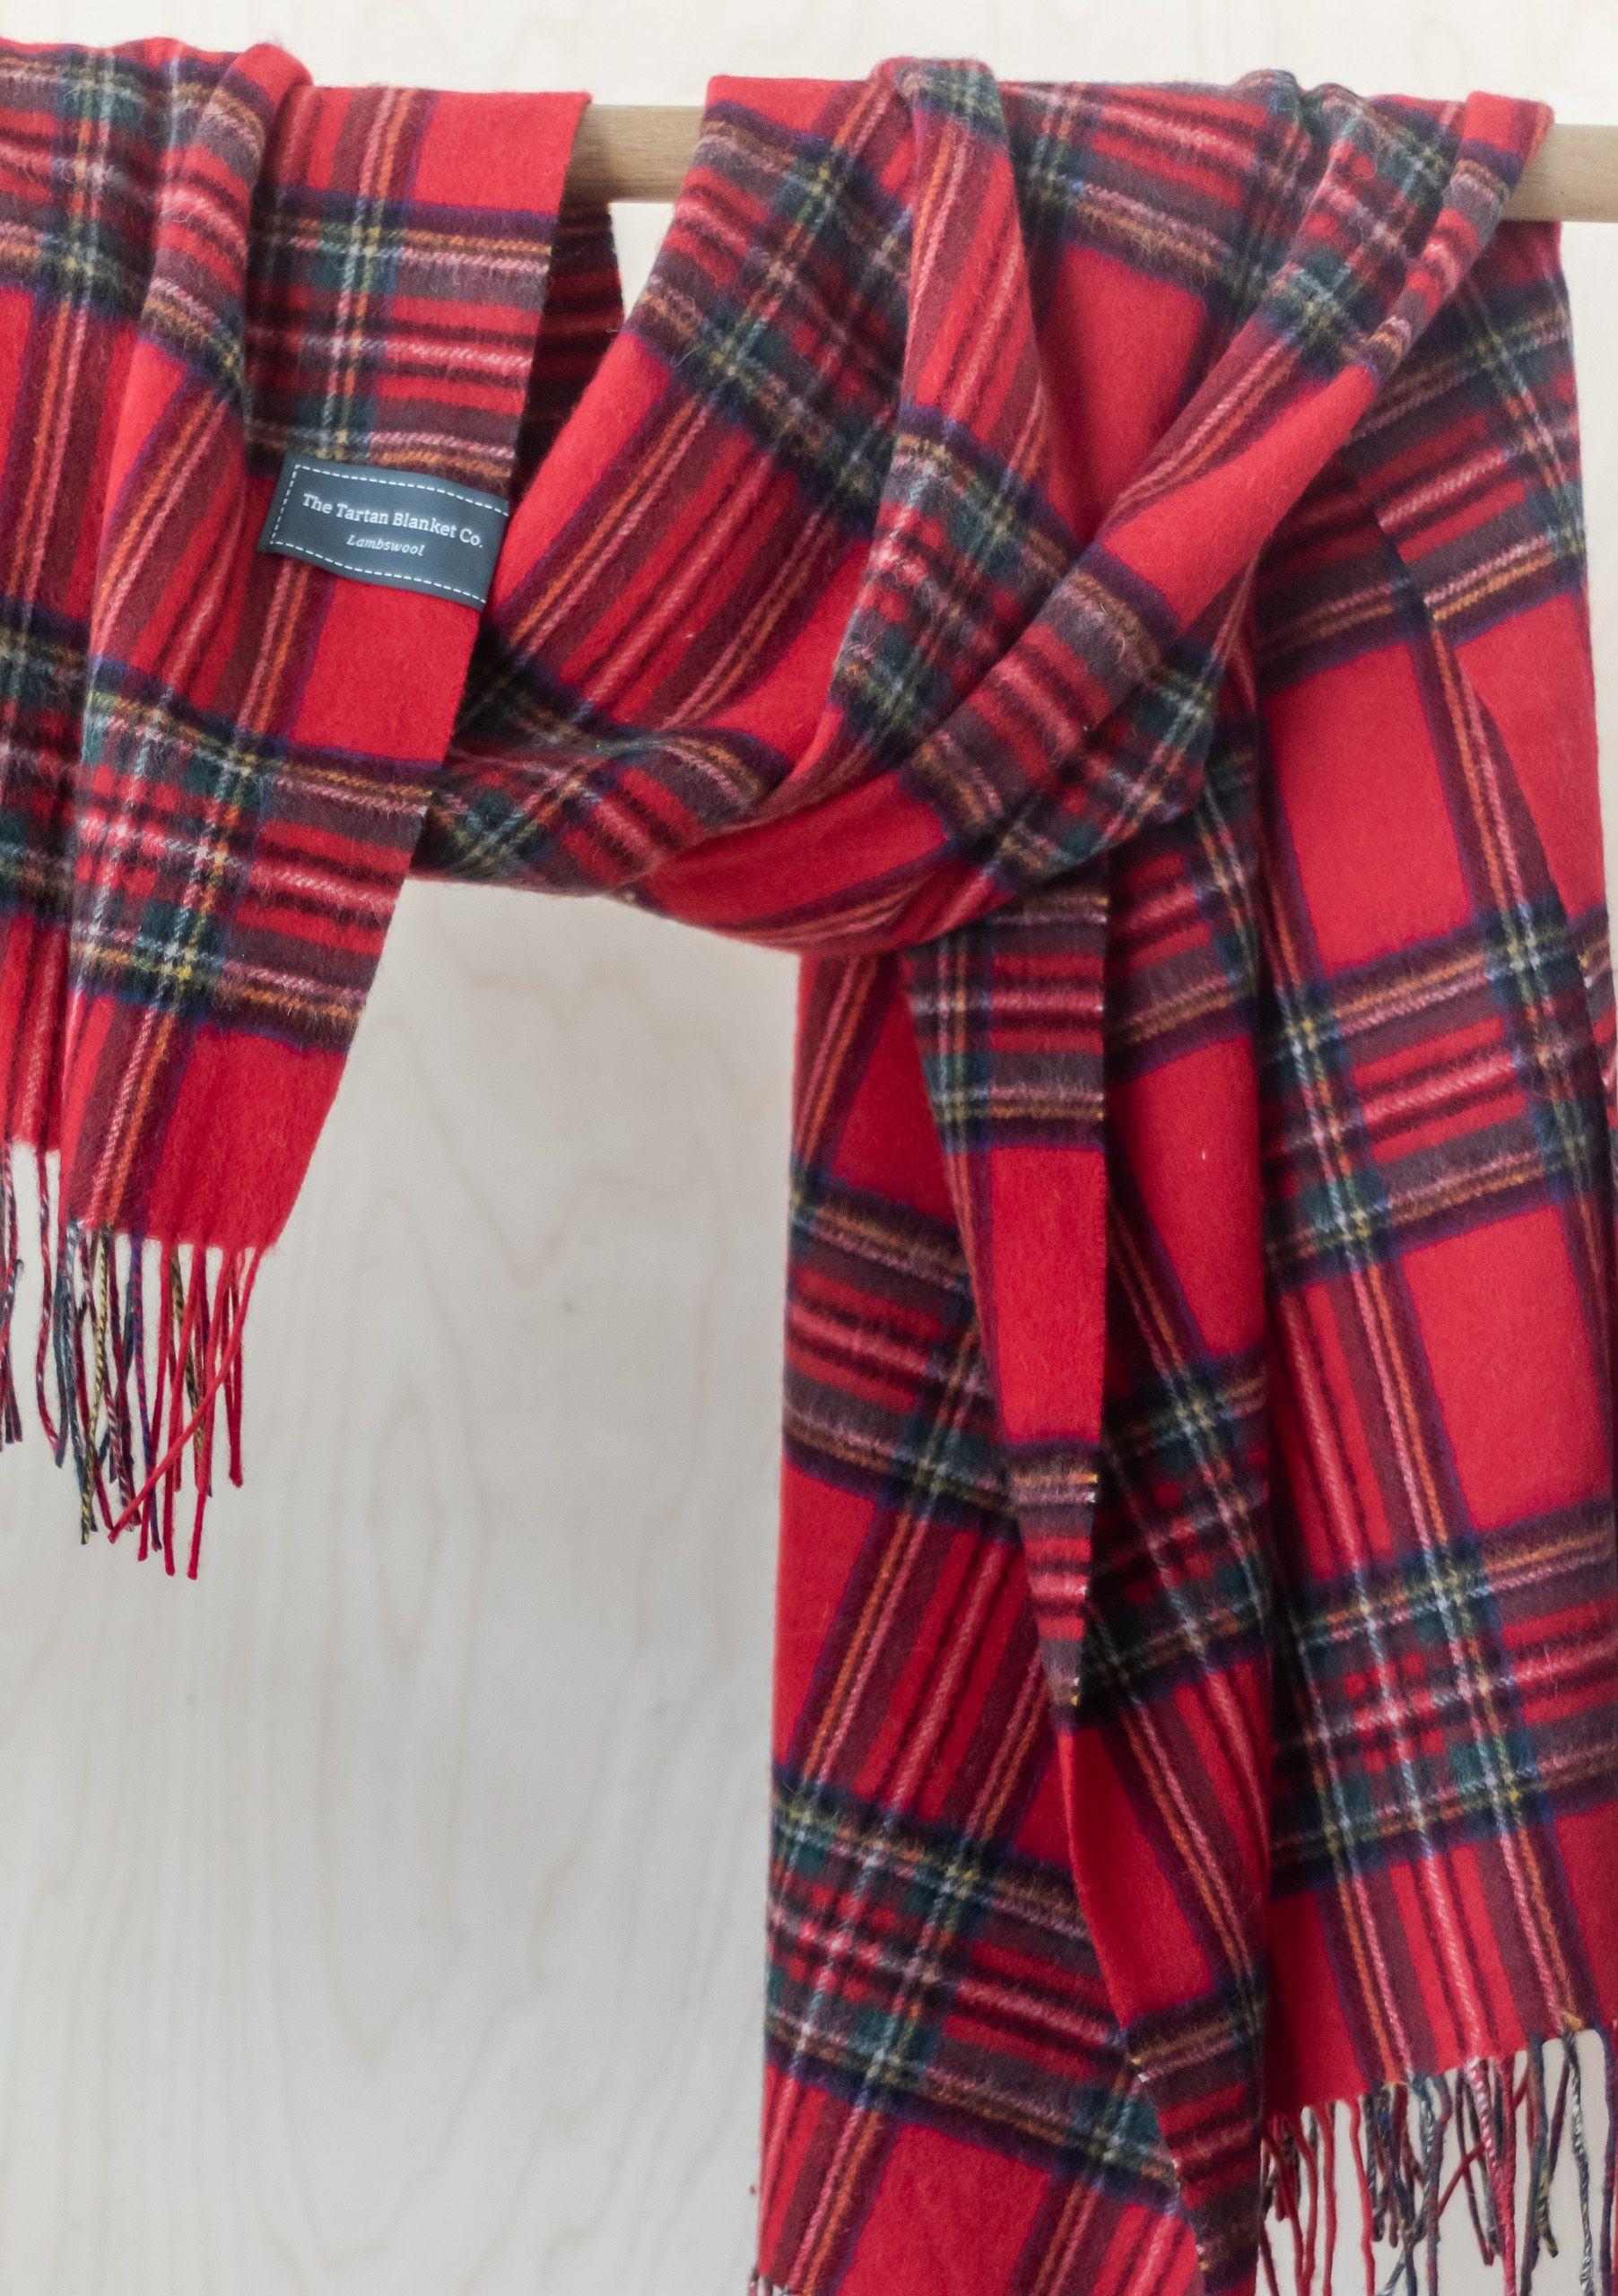 Lambswool Blanket Scarf in Stewart Royal Tartan